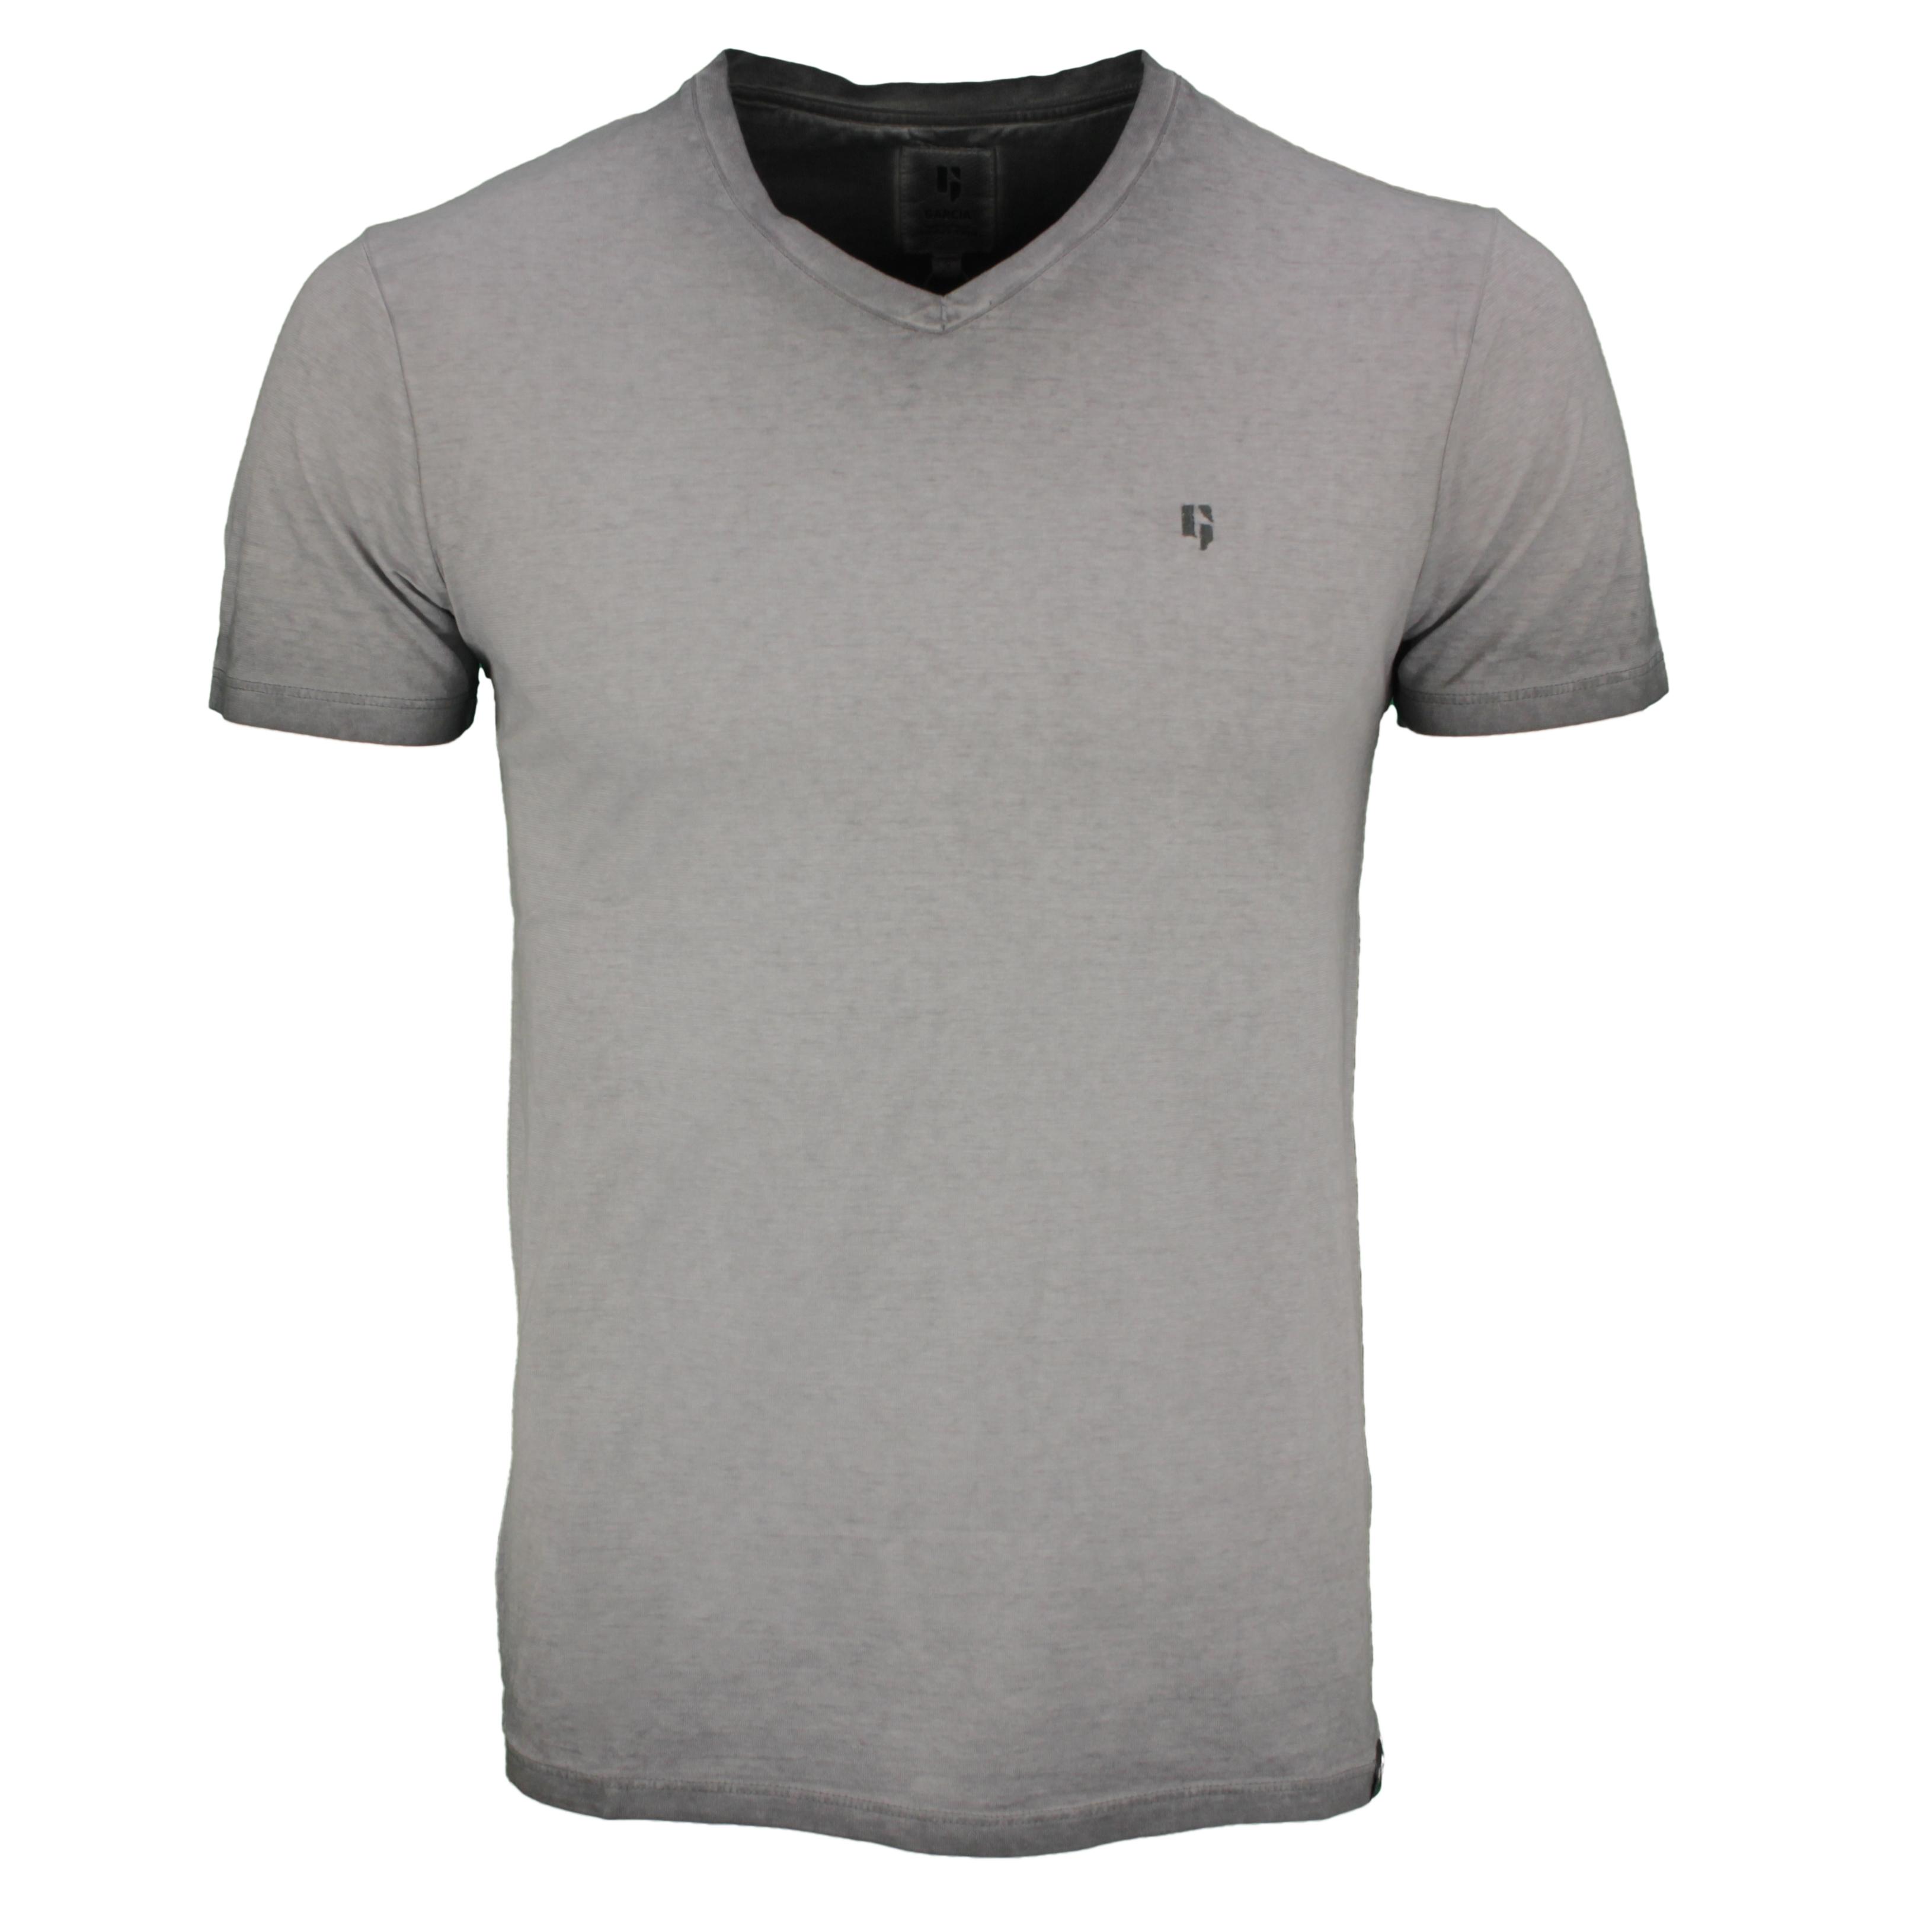 Garcia Herren T-Shirt Shirt kurzarm grau unifarben Used Look E11020 5001 iron grey